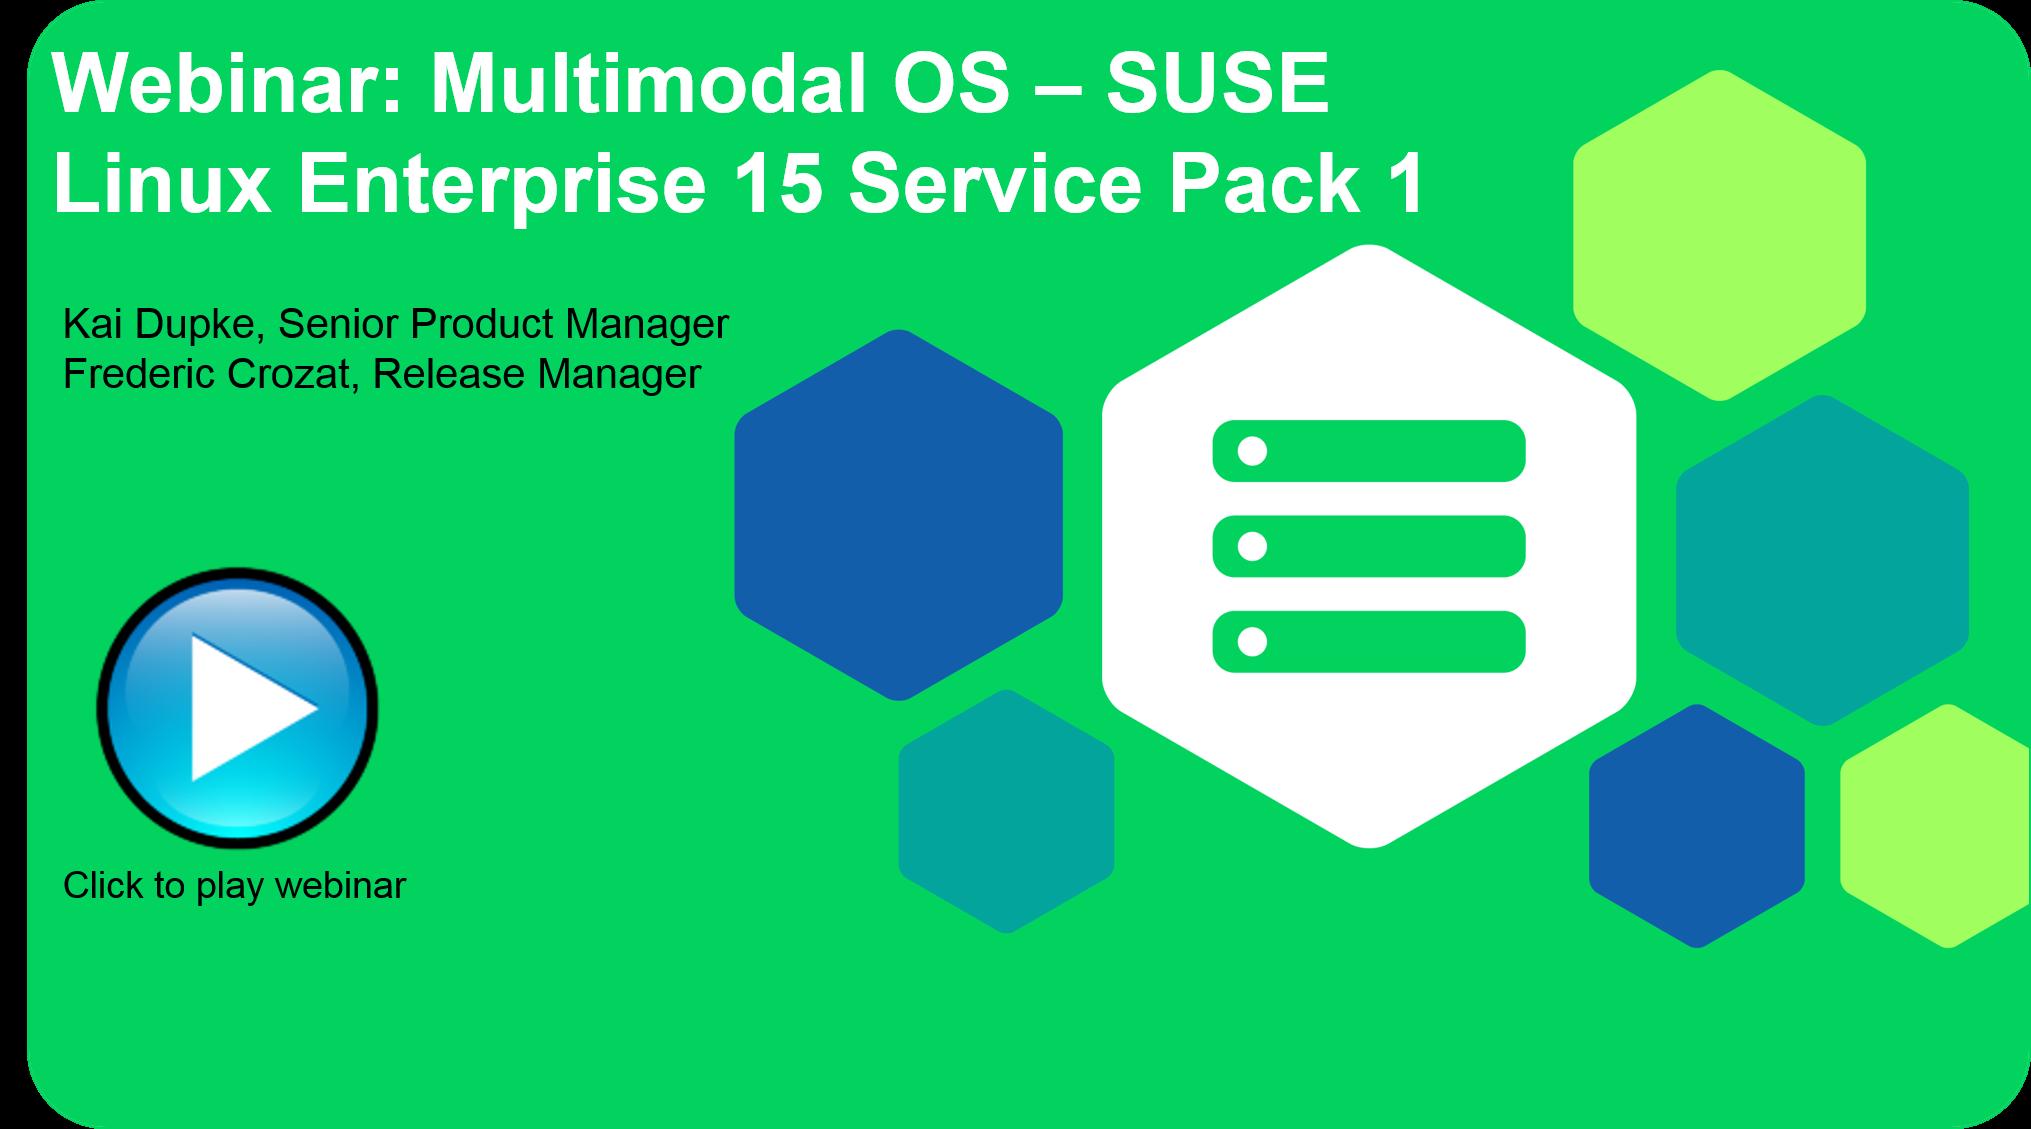 SUSE Webinar - Multimodal OS